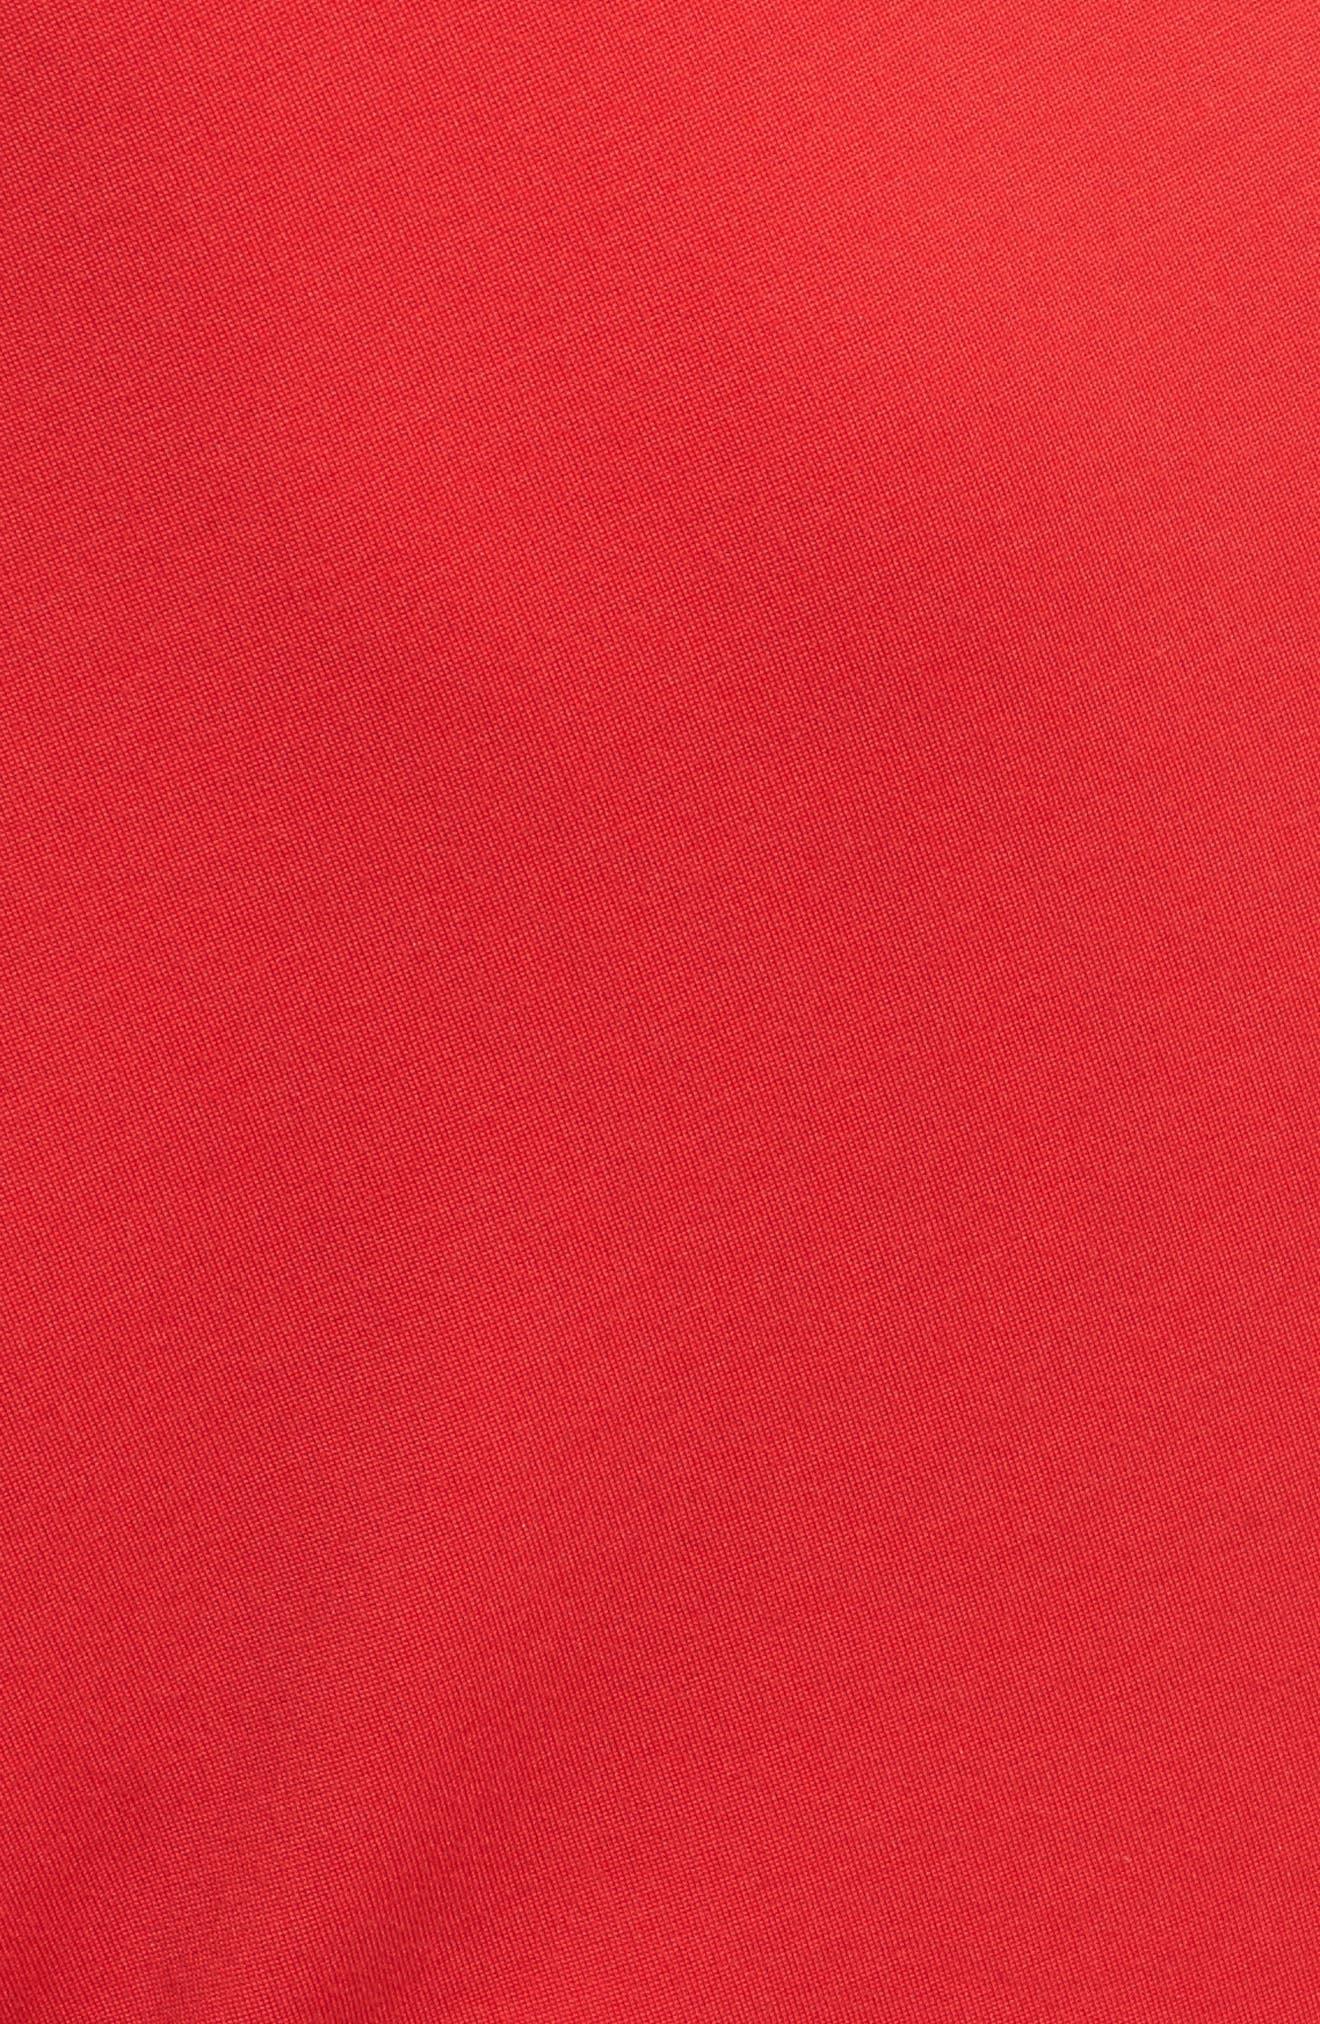 Thiestis Body-Con Dress,                             Alternate thumbnail 10, color,